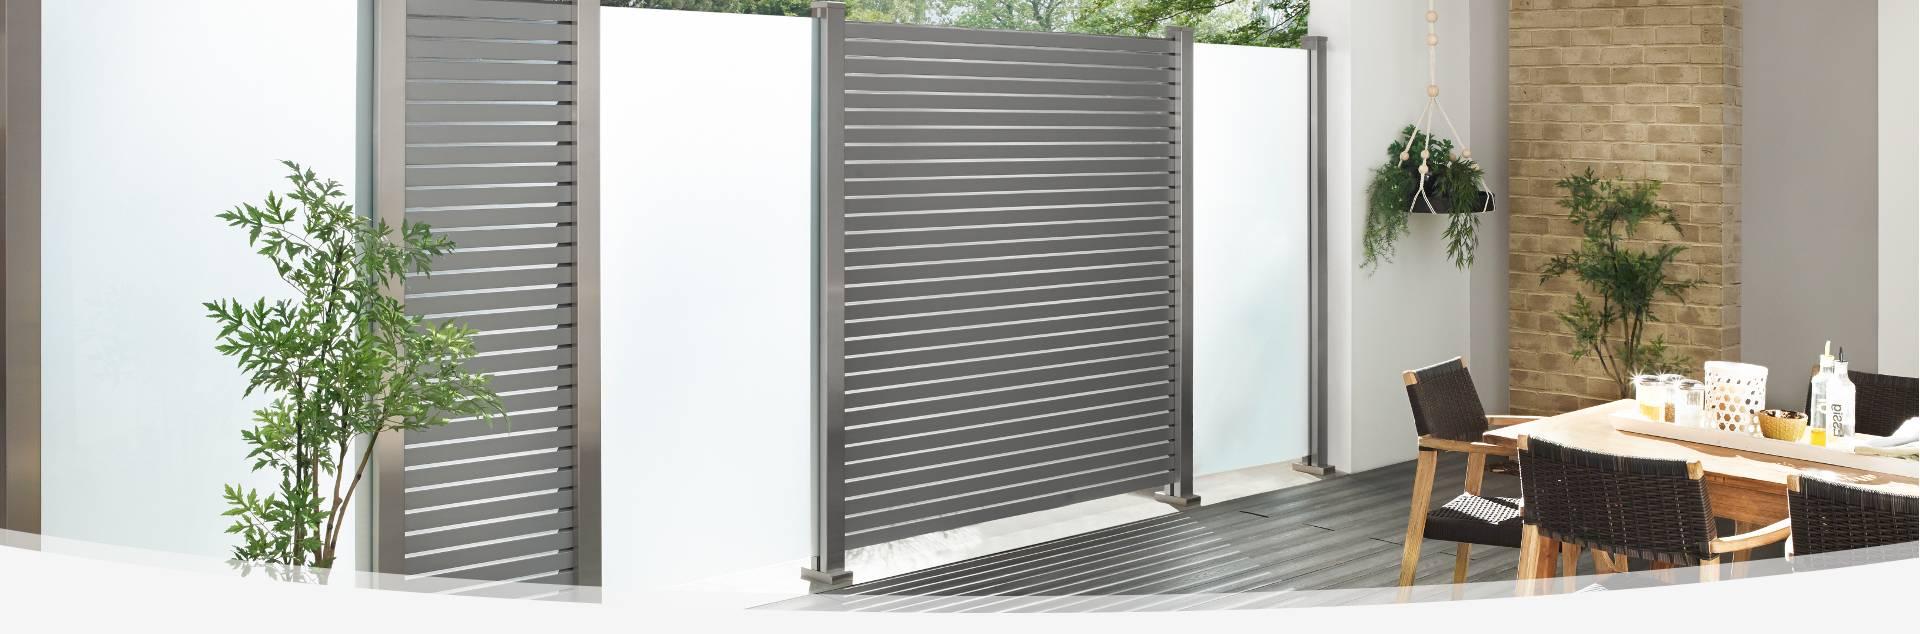 sichtschutz z une holzland gattermann. Black Bedroom Furniture Sets. Home Design Ideas